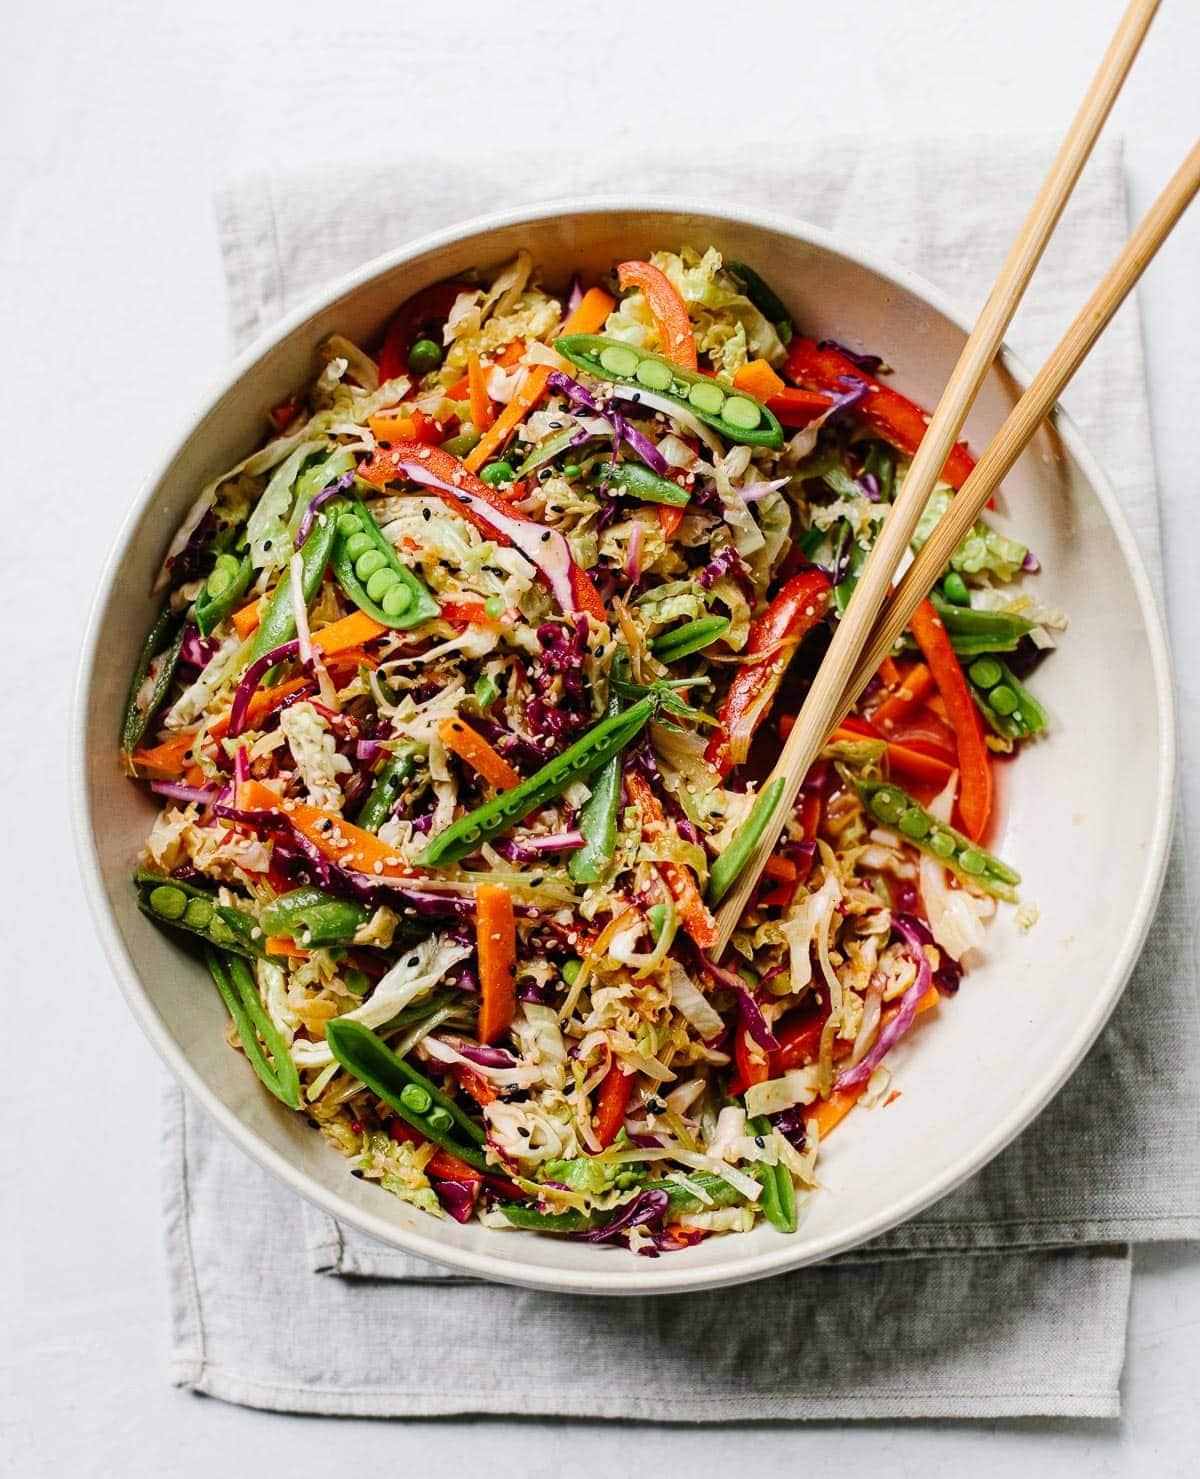 Asian Vegetable Slaw with Ginger Dressing